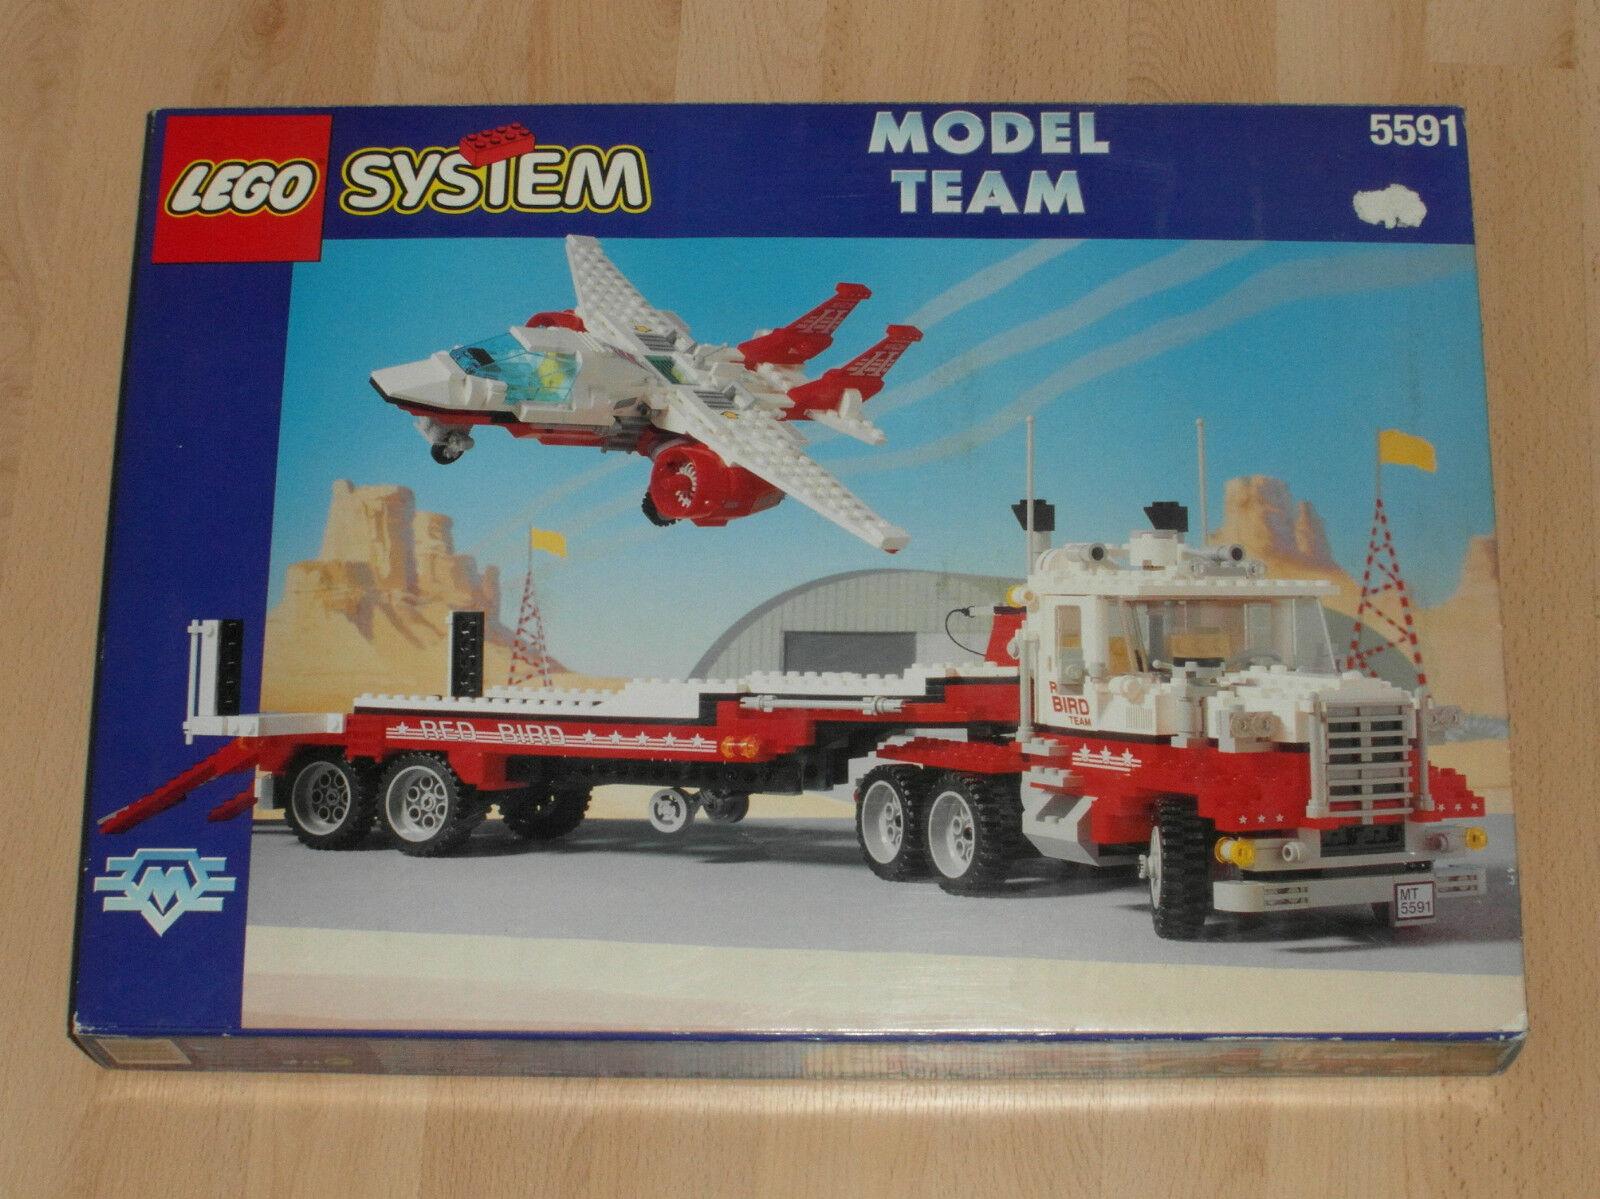 Lego System Model Team 5591 NEU MISB  | Charakteristisch